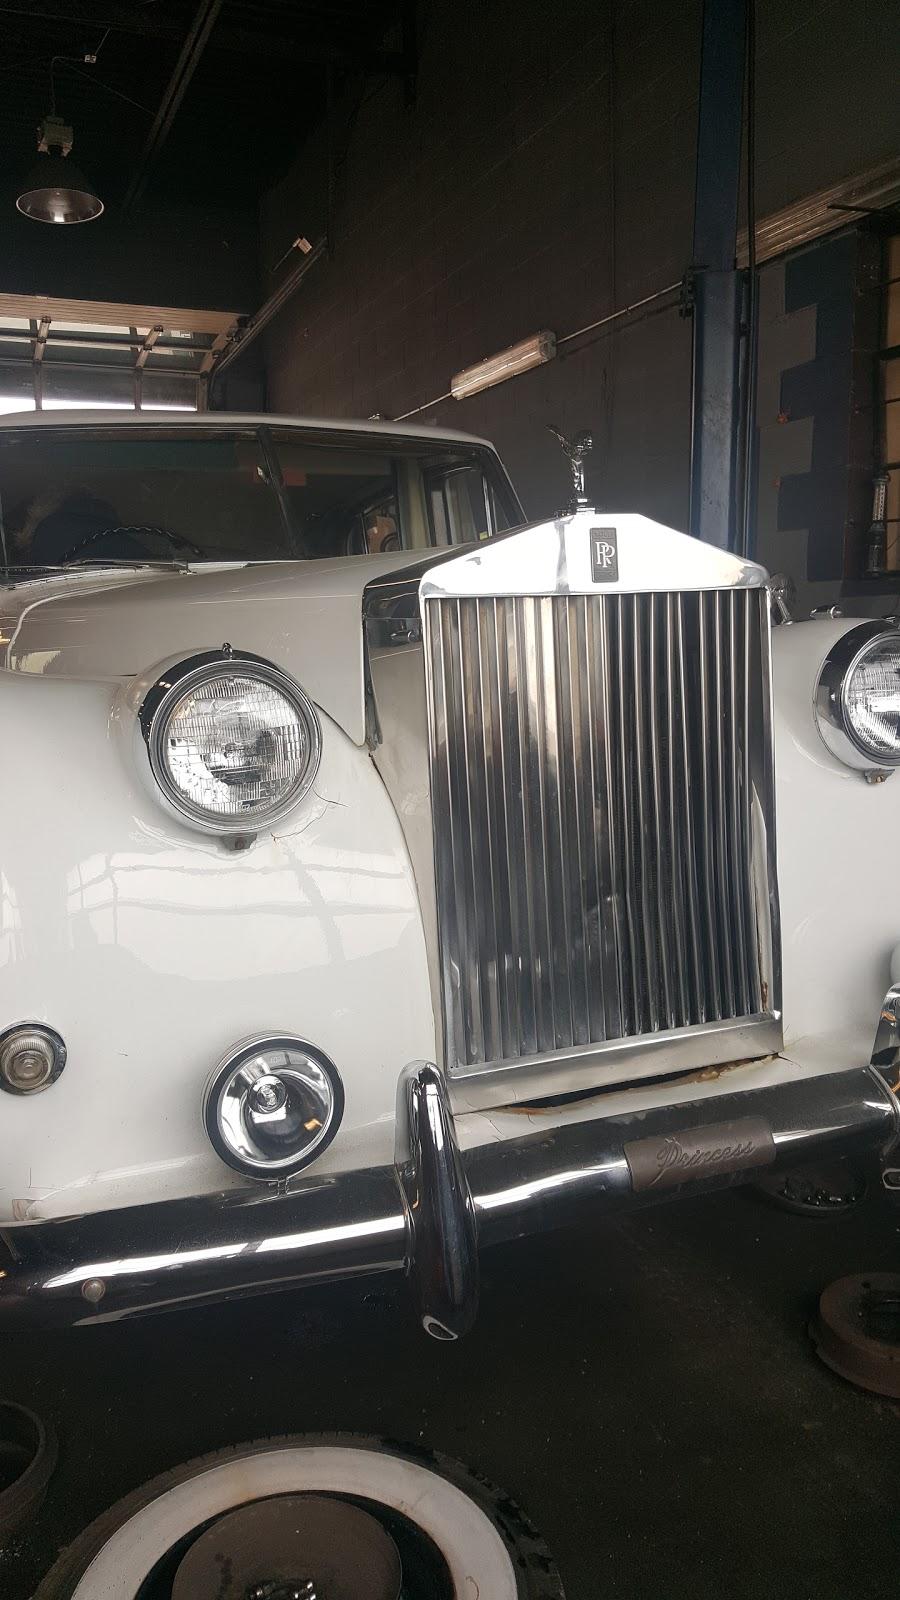 TM Auto | car dealer | 73 Bridge St E, Kitchener, ON N2K 1J8, Canada | 5198800000 OR +1 519-880-0000